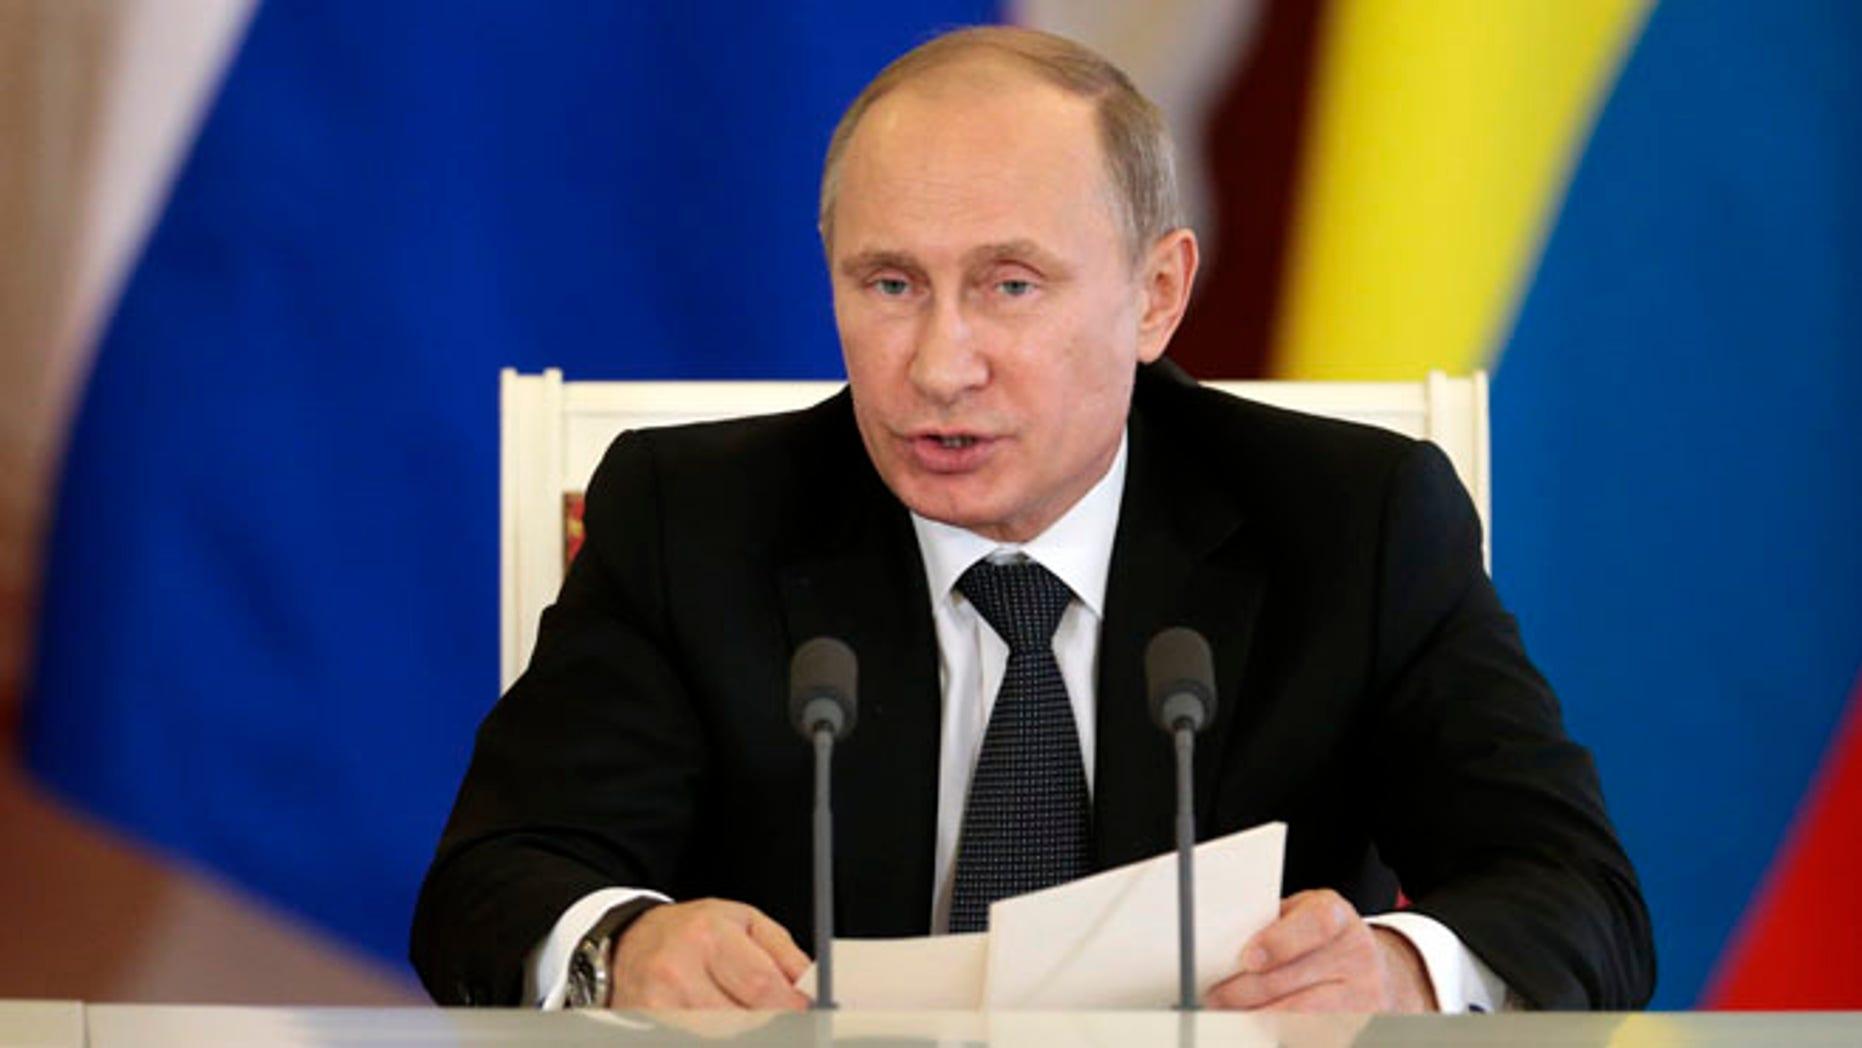 Russian President Vladimir Putin speaks in Moscow's Kremlin, Russia, on Tuesday, Oct. 29, 2013.